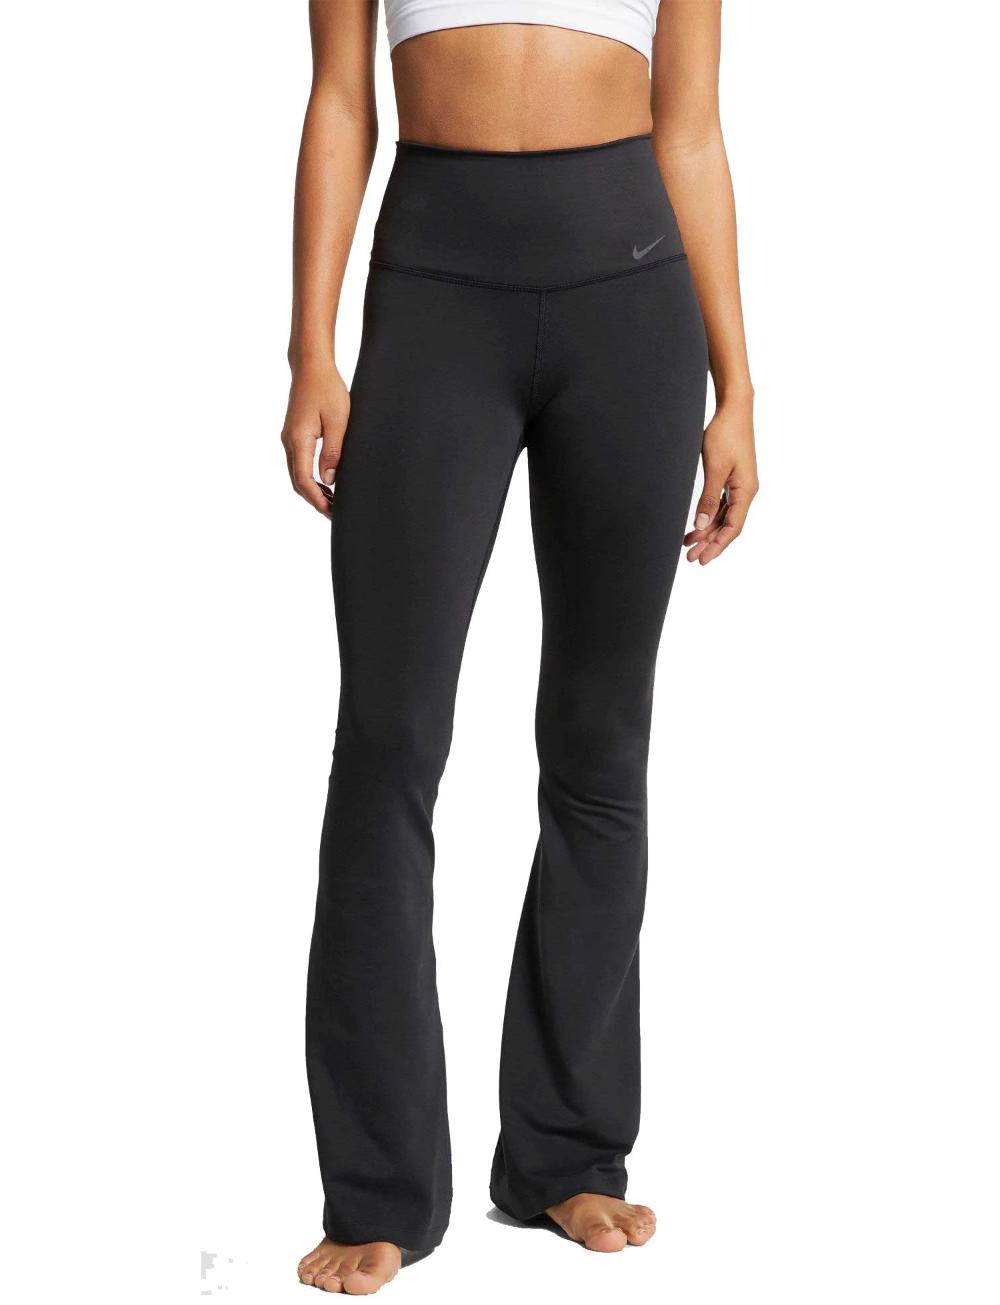 Nike Womens Yoga Pants